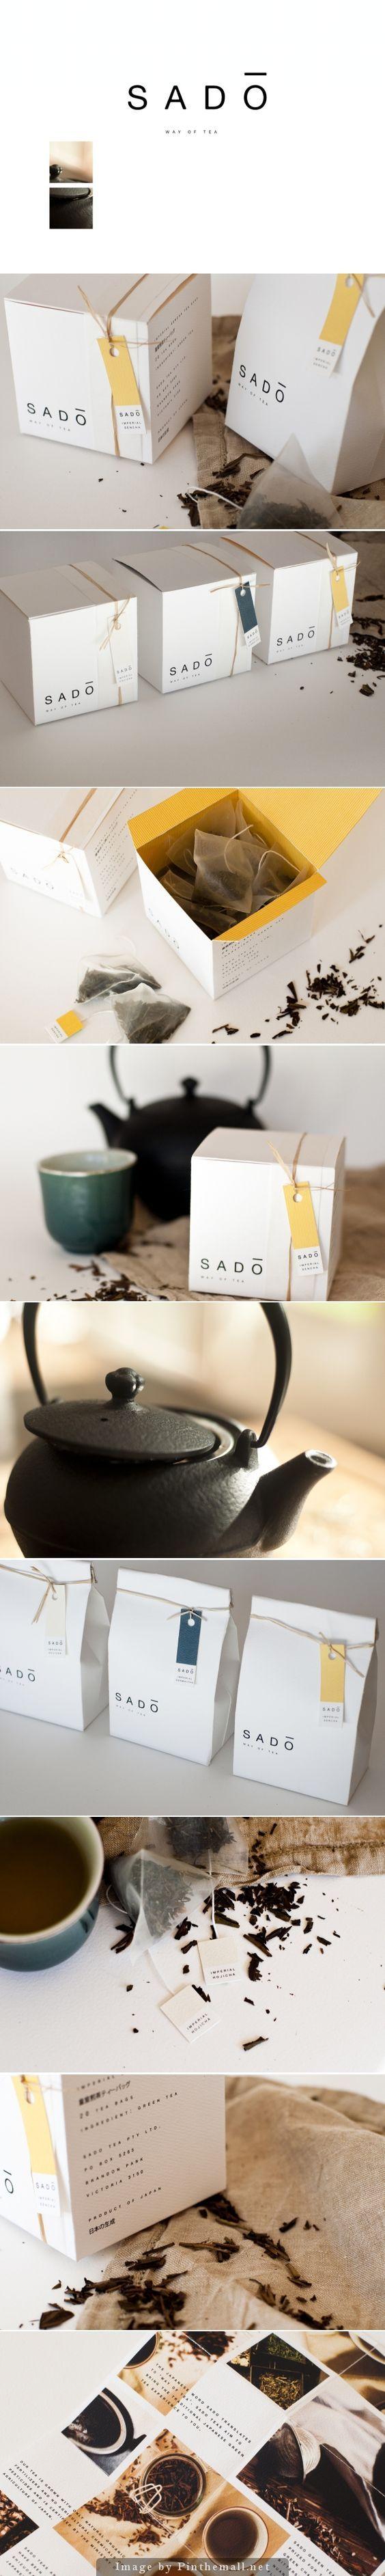 Sado Tea Packaging | Fivestar Branding – Design and Branding Agency & Inspiration Gallery